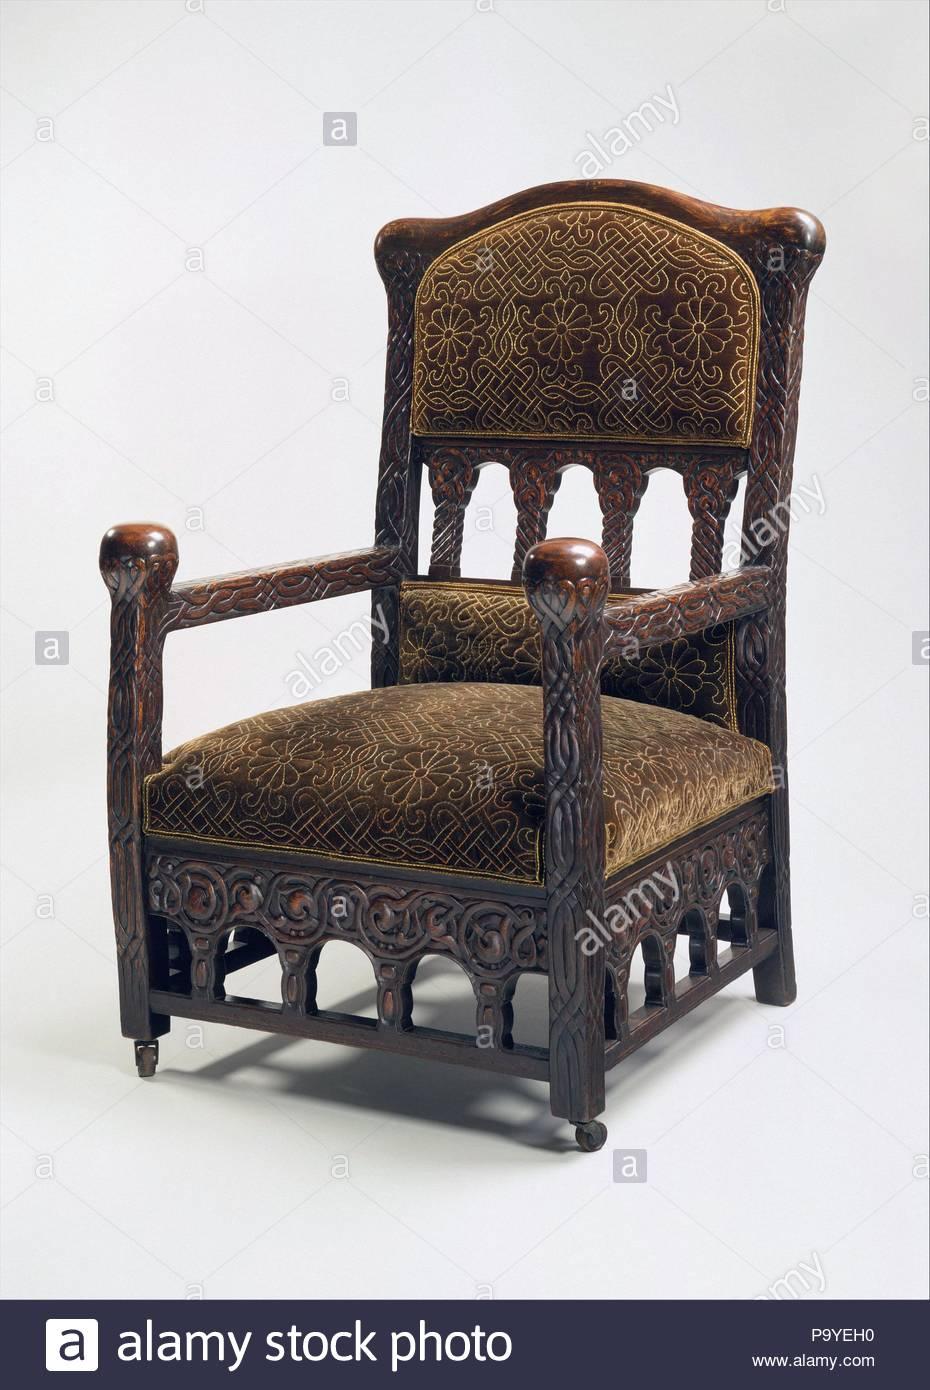 unusual armchair elegant dining room chair covers ca 1891 92 made in new york united states american oak silk velvet 45 x 28 25 1 2 114 3 71 64 8 cm furniture